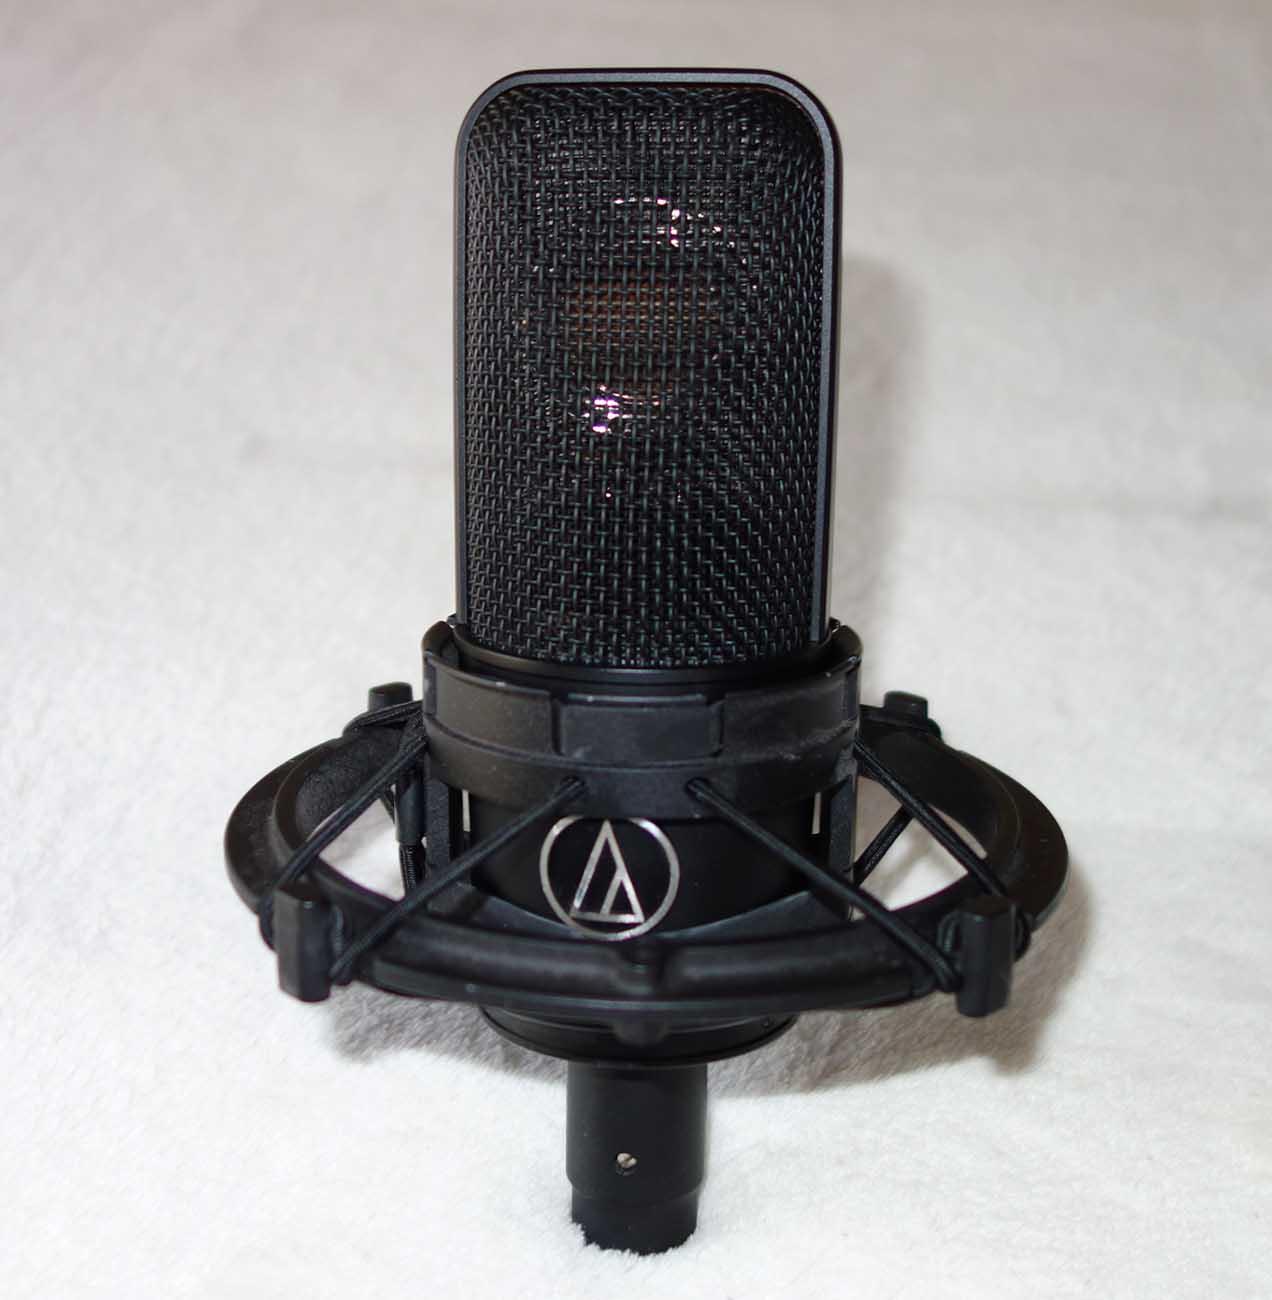 Vintage 1990s Audio Technica AT-4040 Cardioid Condenser Mic w/Original Mount, Case